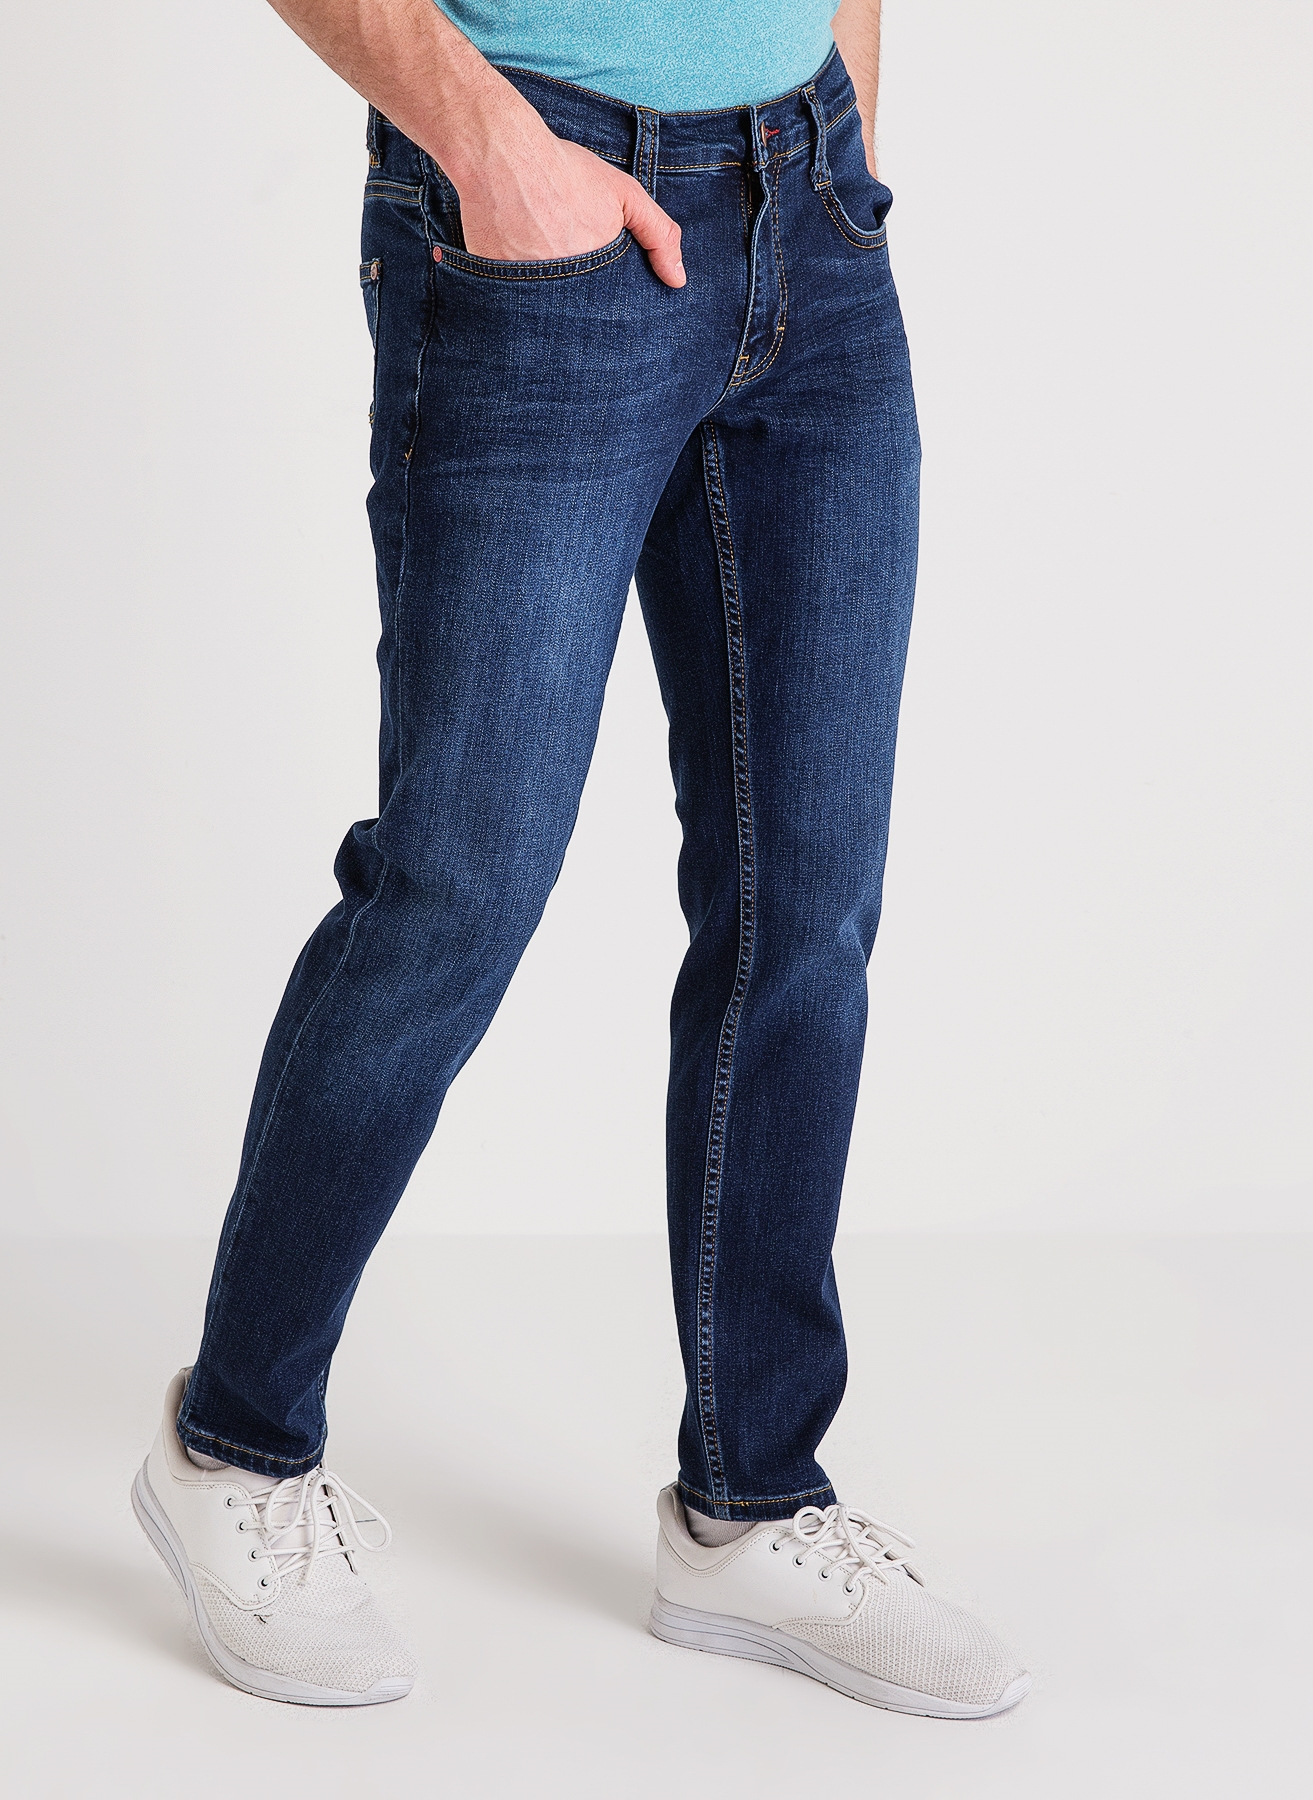 Mustang Mavi Klasik Pantolon 34-34 5000200048012 Ürün Resmi